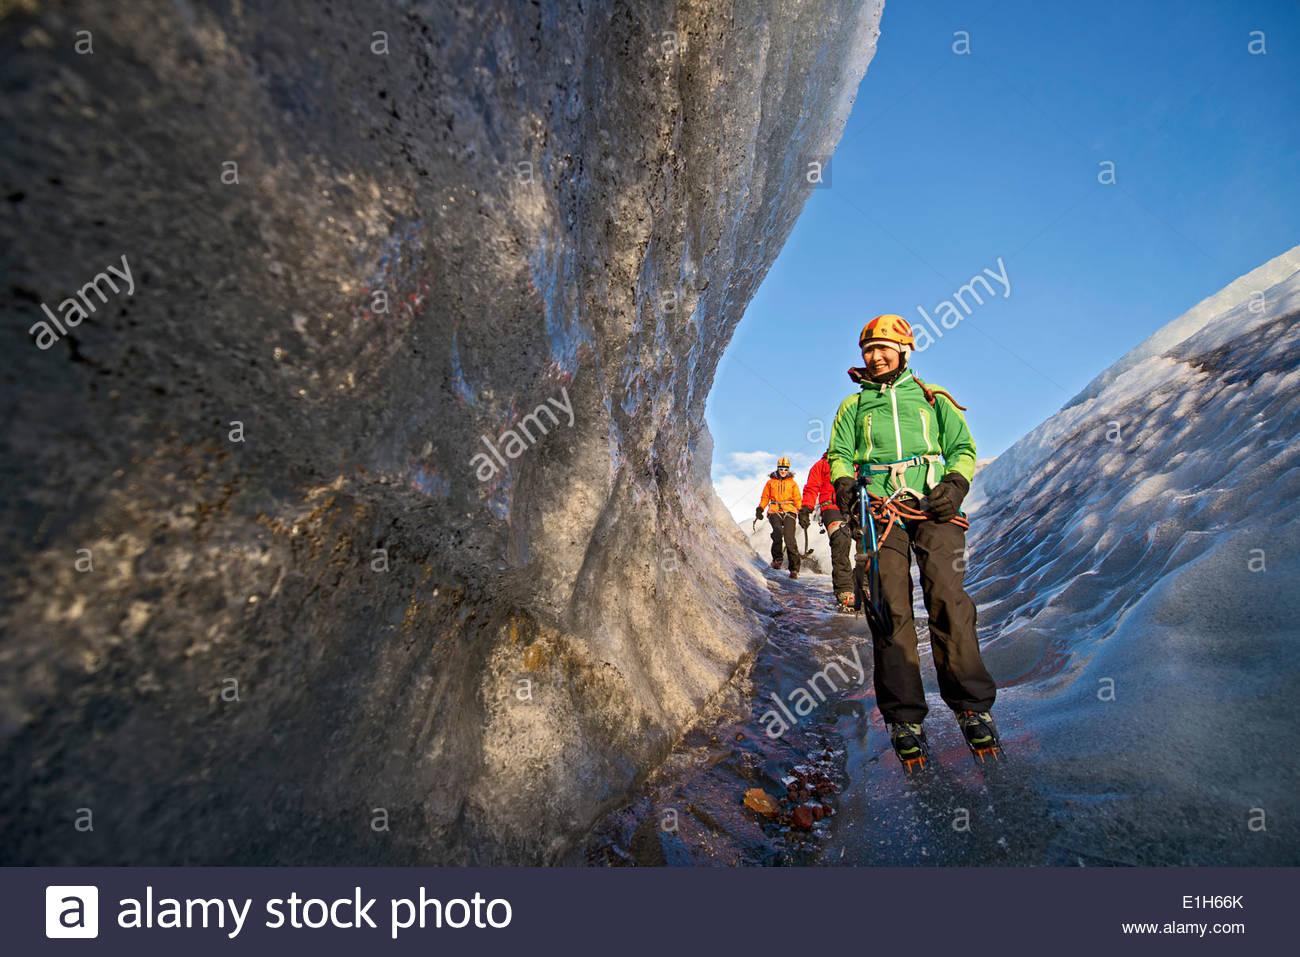 Group of climbers exploring ice, Svinafellsjokull, Vatnajokull National Park, Iceland - Stock Image